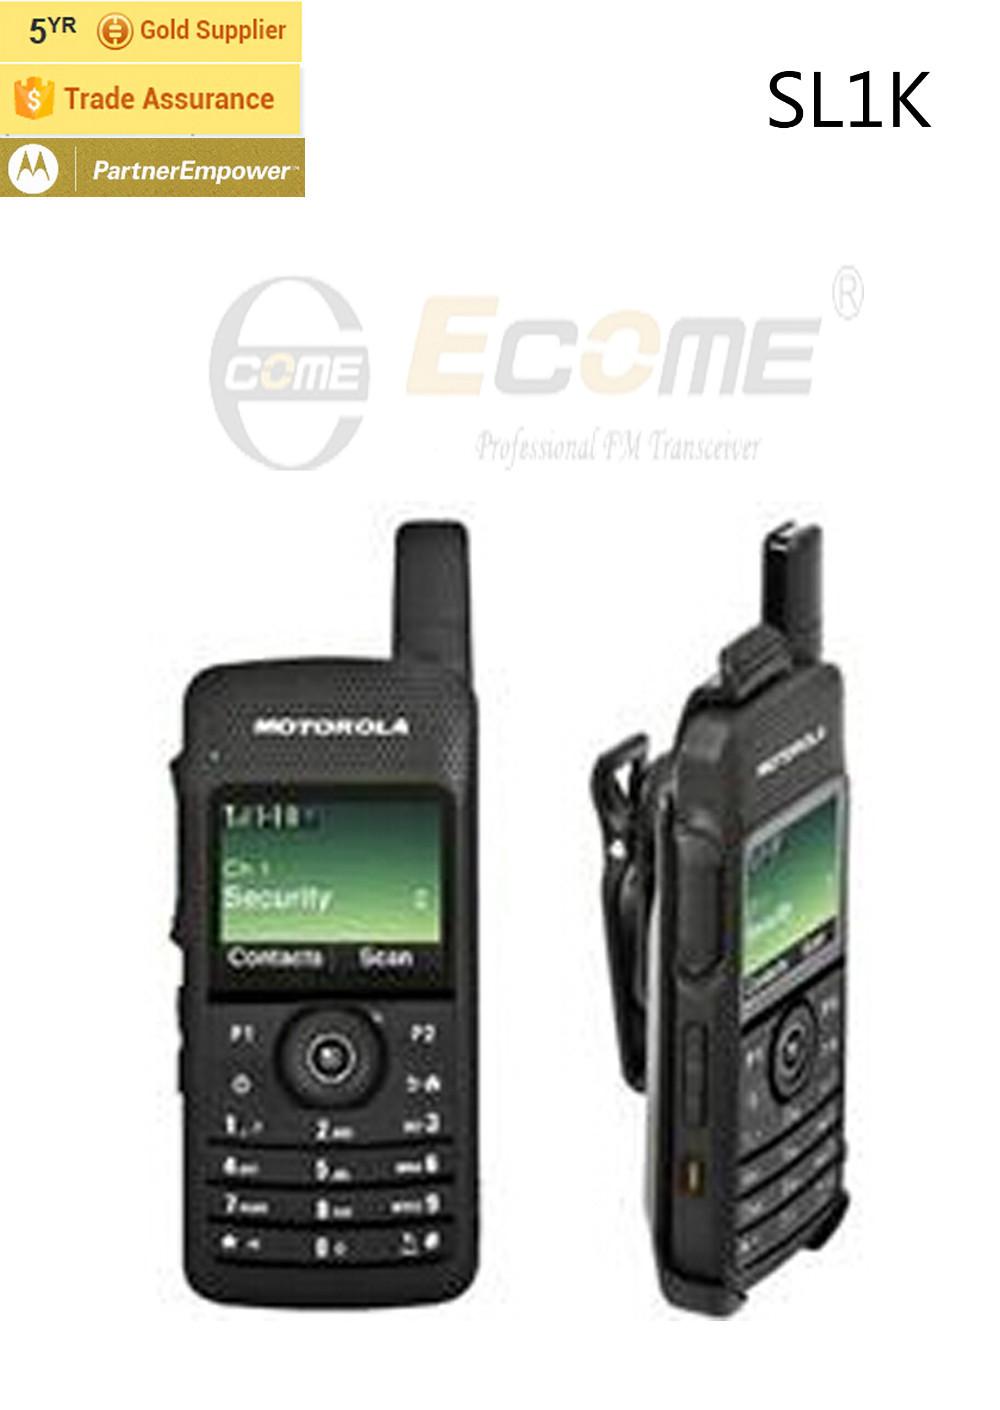 Portable 2W DMR Digital Radio Motorola SL1K(China (Mainland))